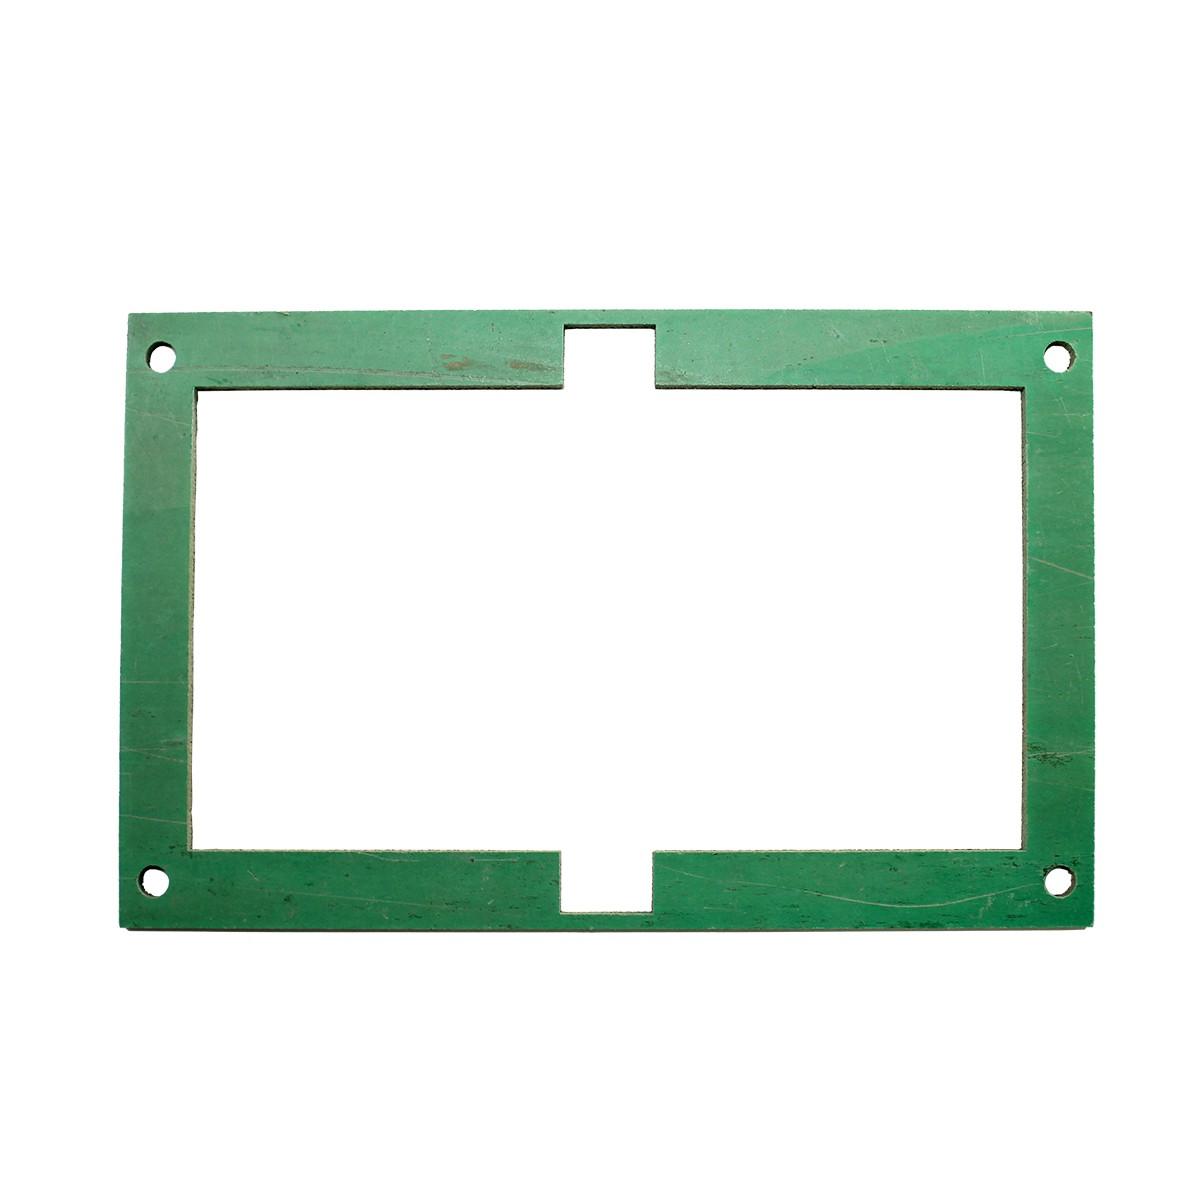 Table Top Vulcanizer Heating Element Gasket - Standard